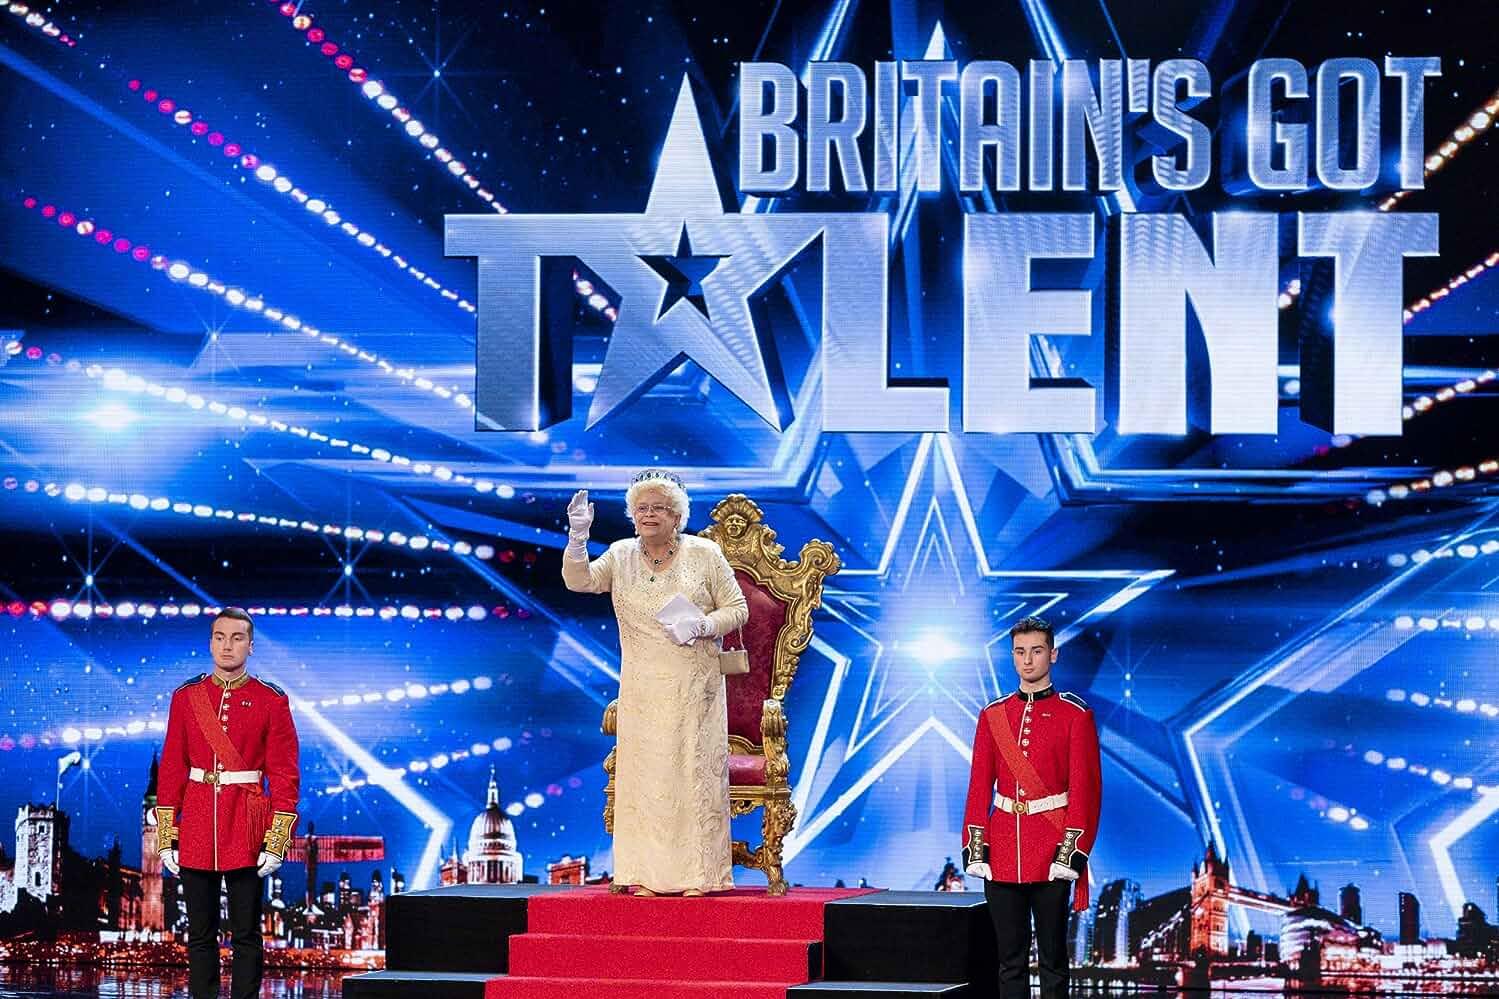 Britain's Got Talent (2019) WEEK 3 720p 350MB -Akshat Singh Appearance